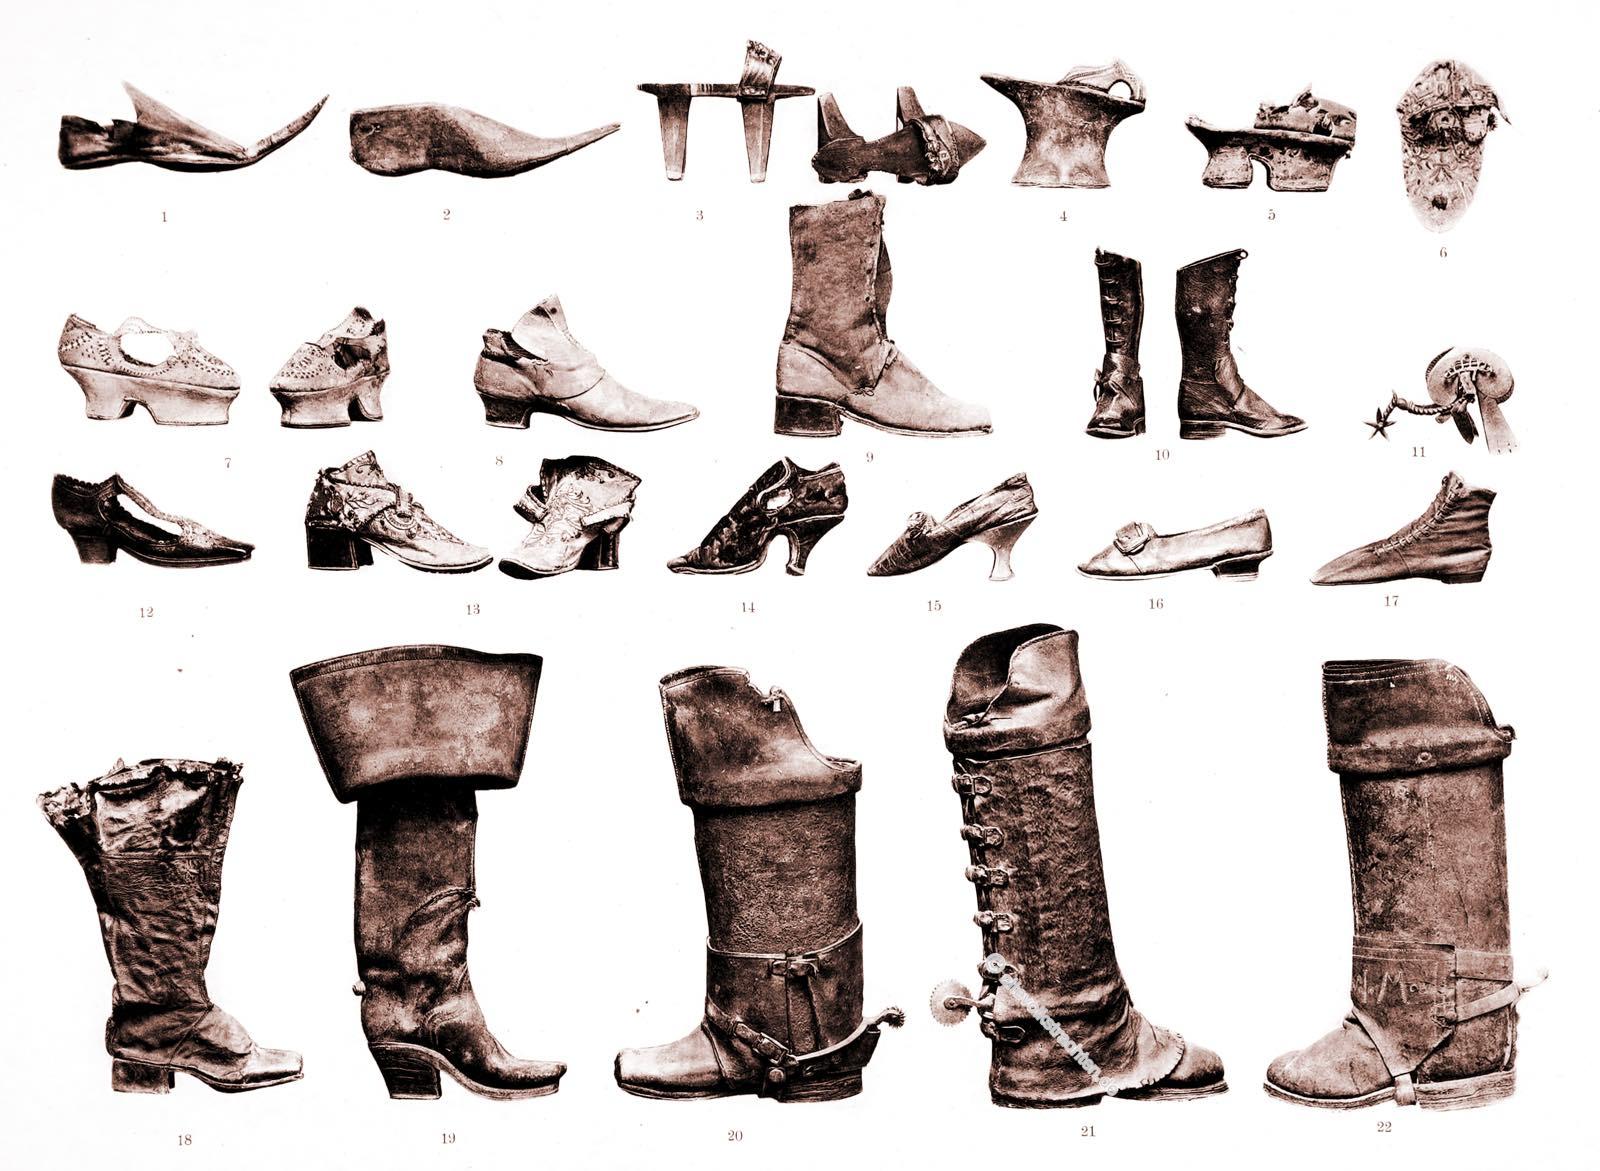 Schuhmode, Fussbekleidungen, Mittelalter, Renaissance, Barock, Rokoko,